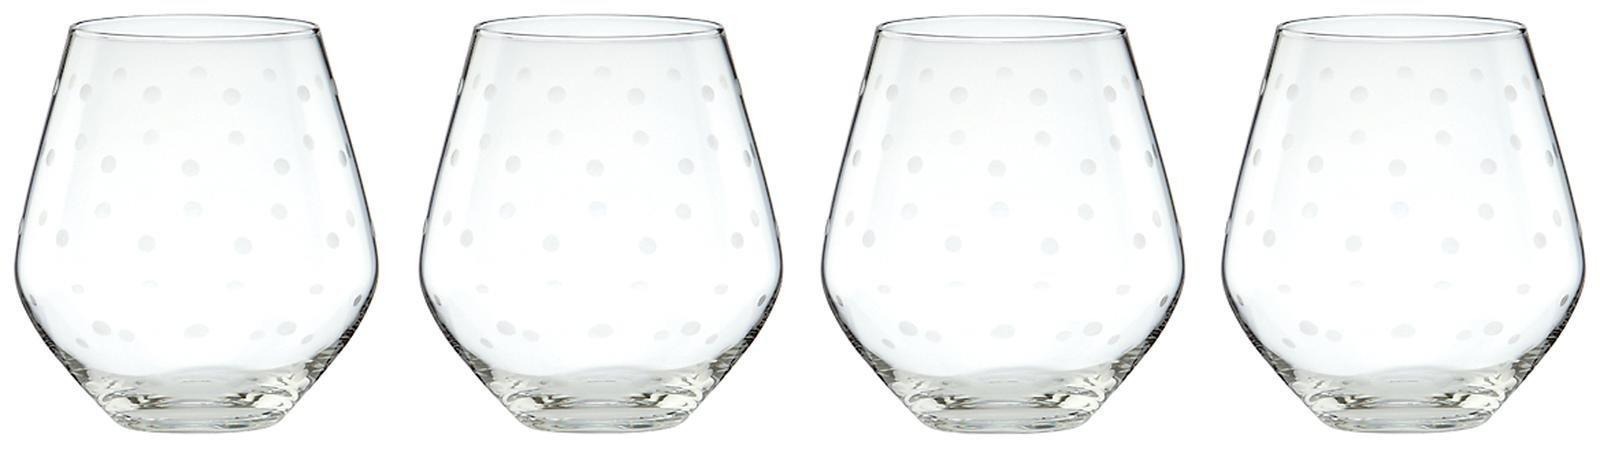 kate spade new york Larabee Dot Stemless Red Wine Glass, Set of 4